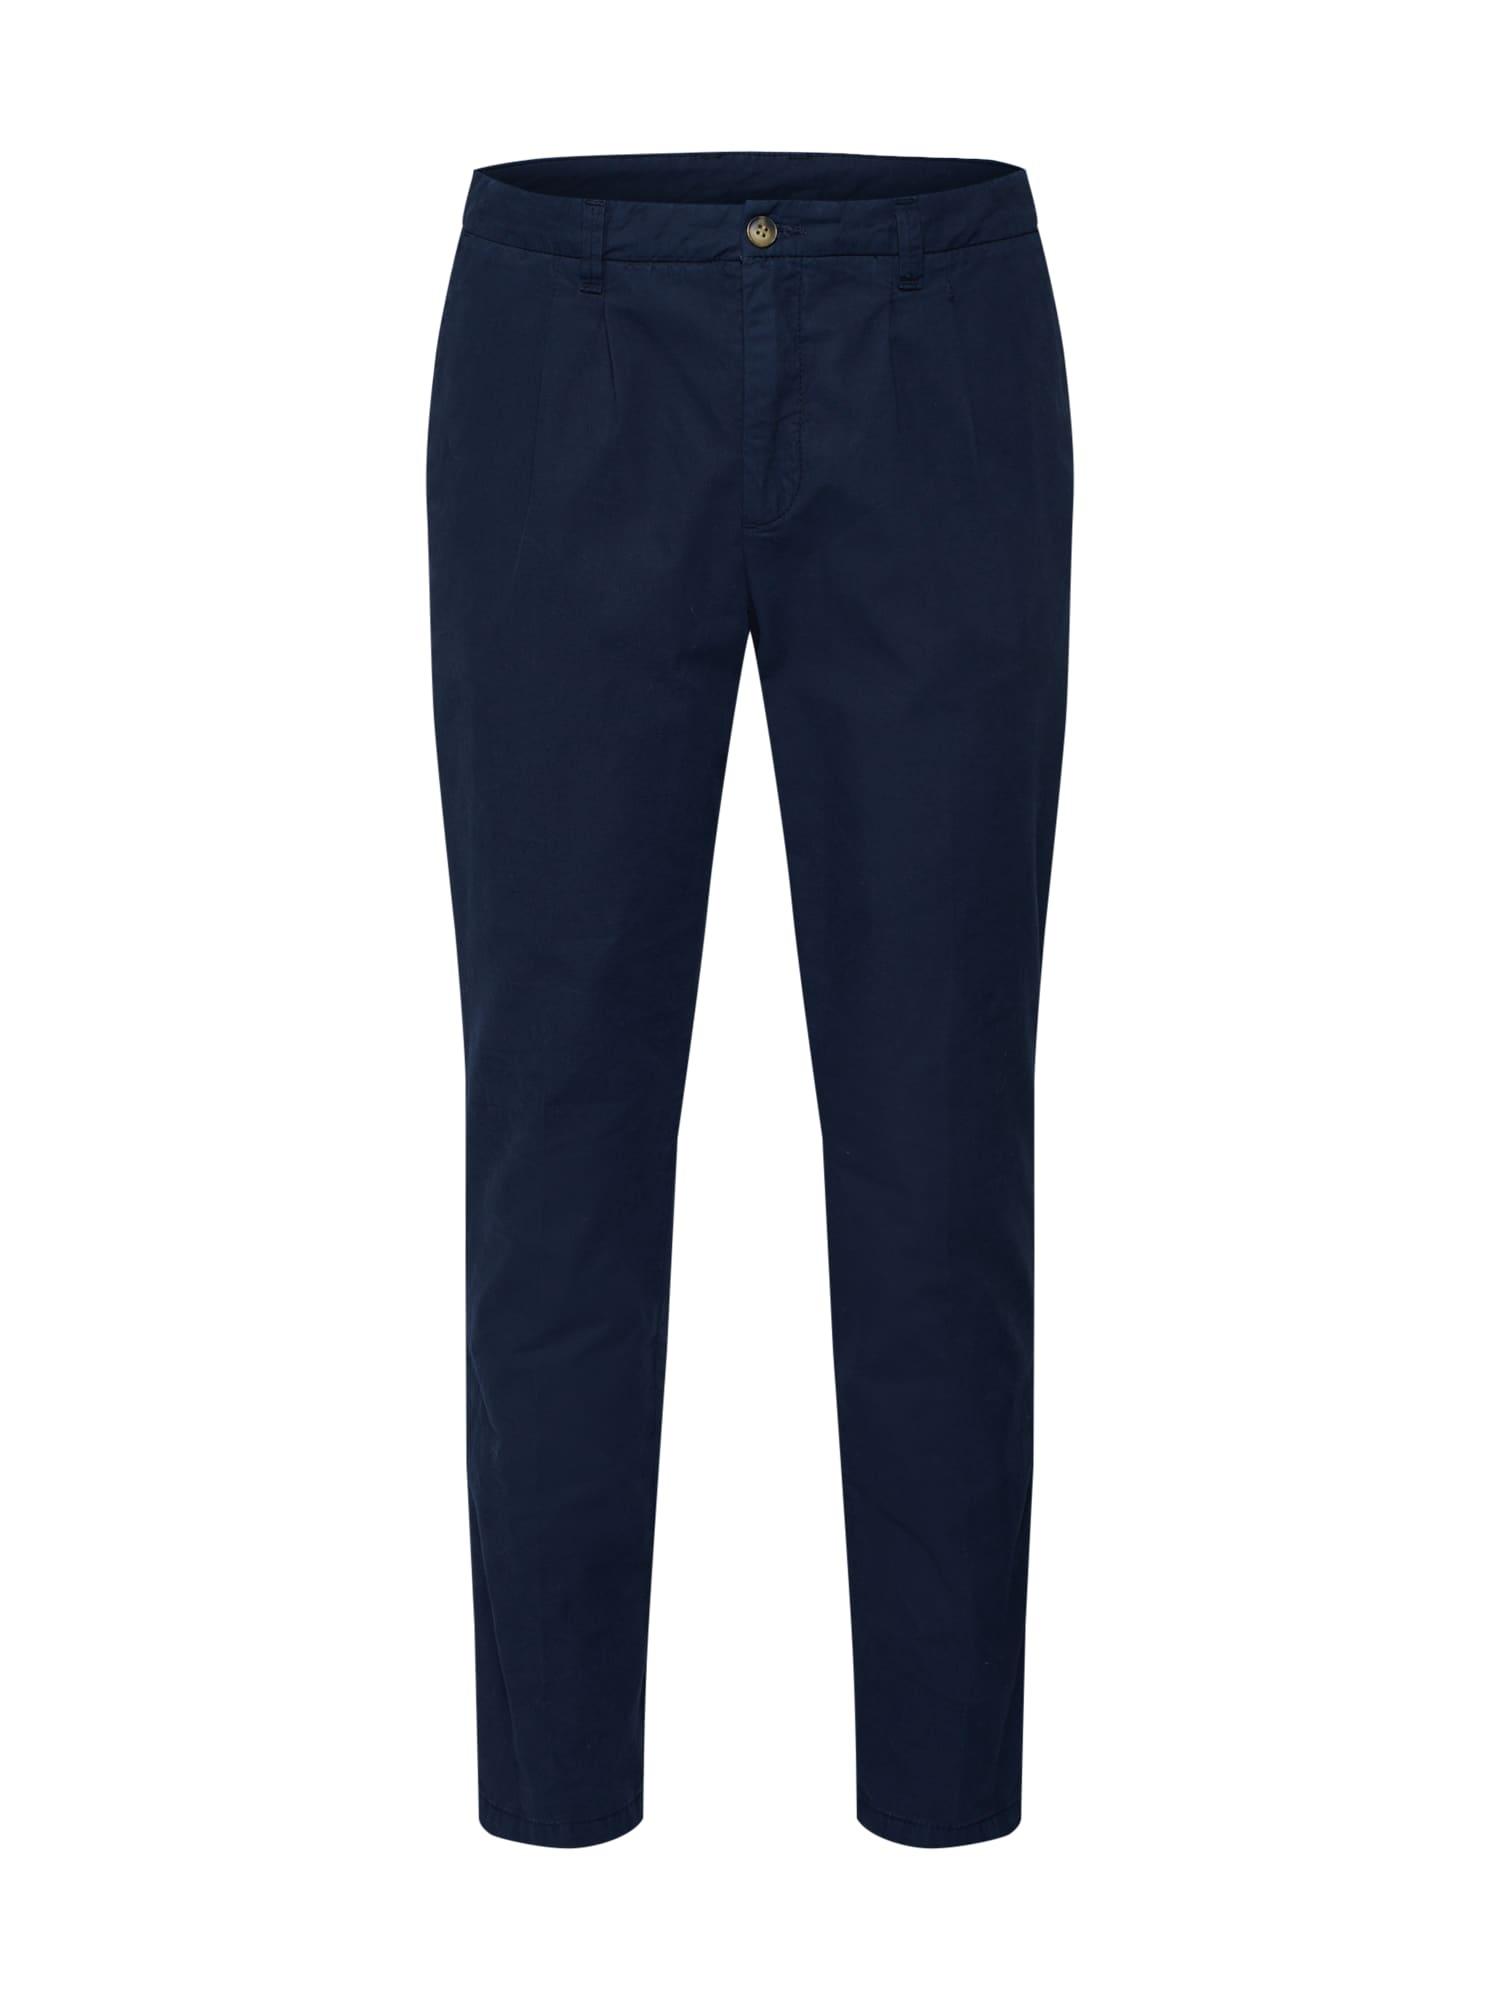 Chino kalhoty Anton námořnická modř MAGIC FOX X ABOUT YOU